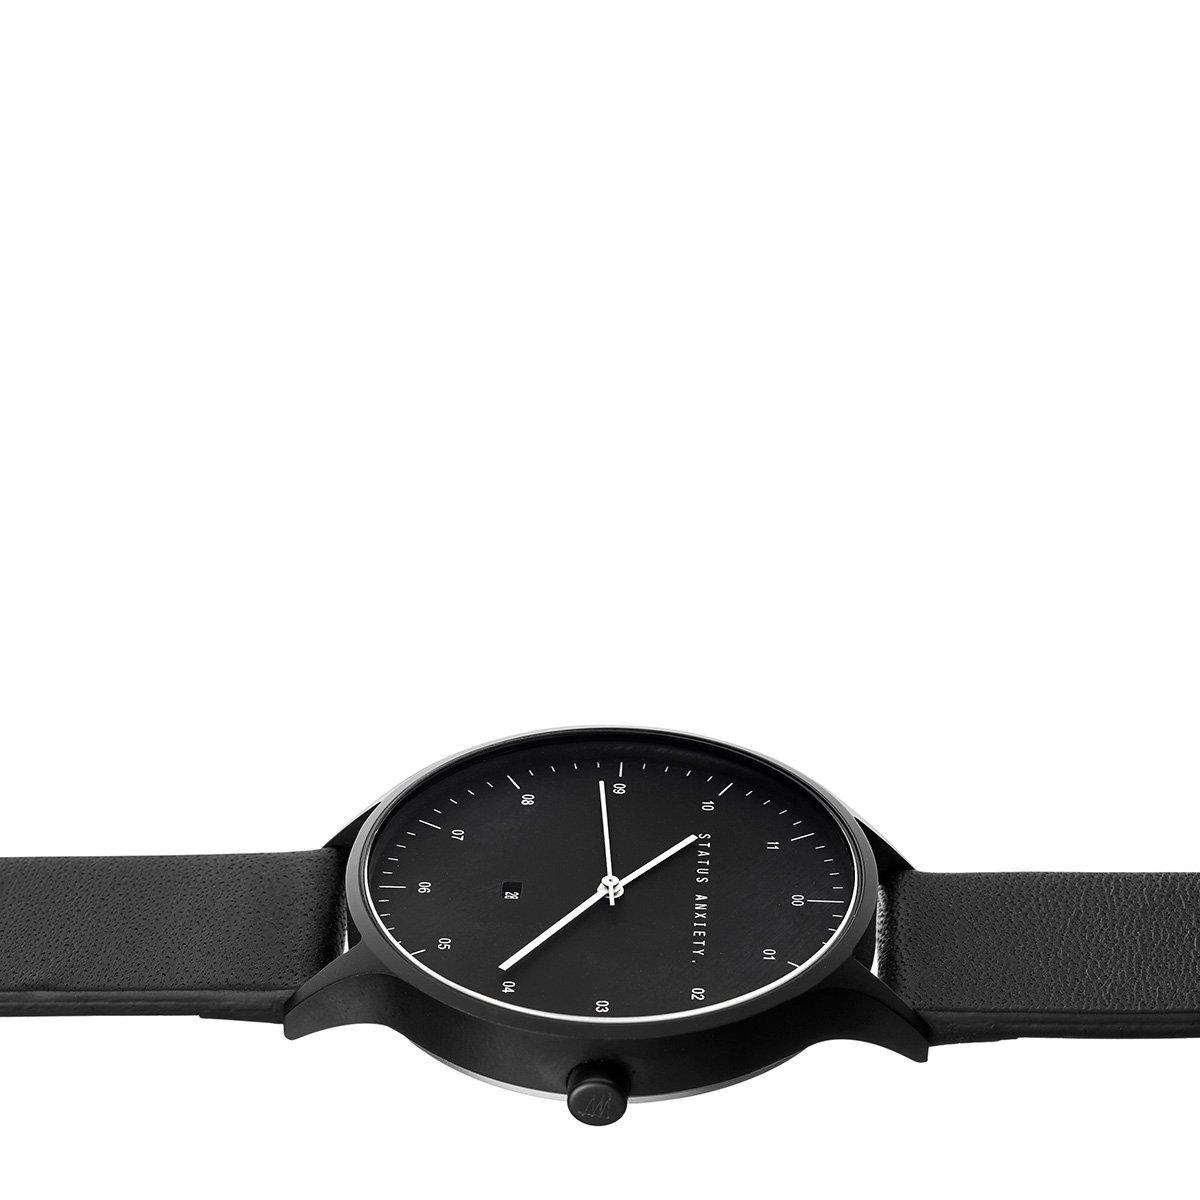 871fb1469 Inertia Watch - Black/Black/Black - Accessories-Bags / Wallets ...